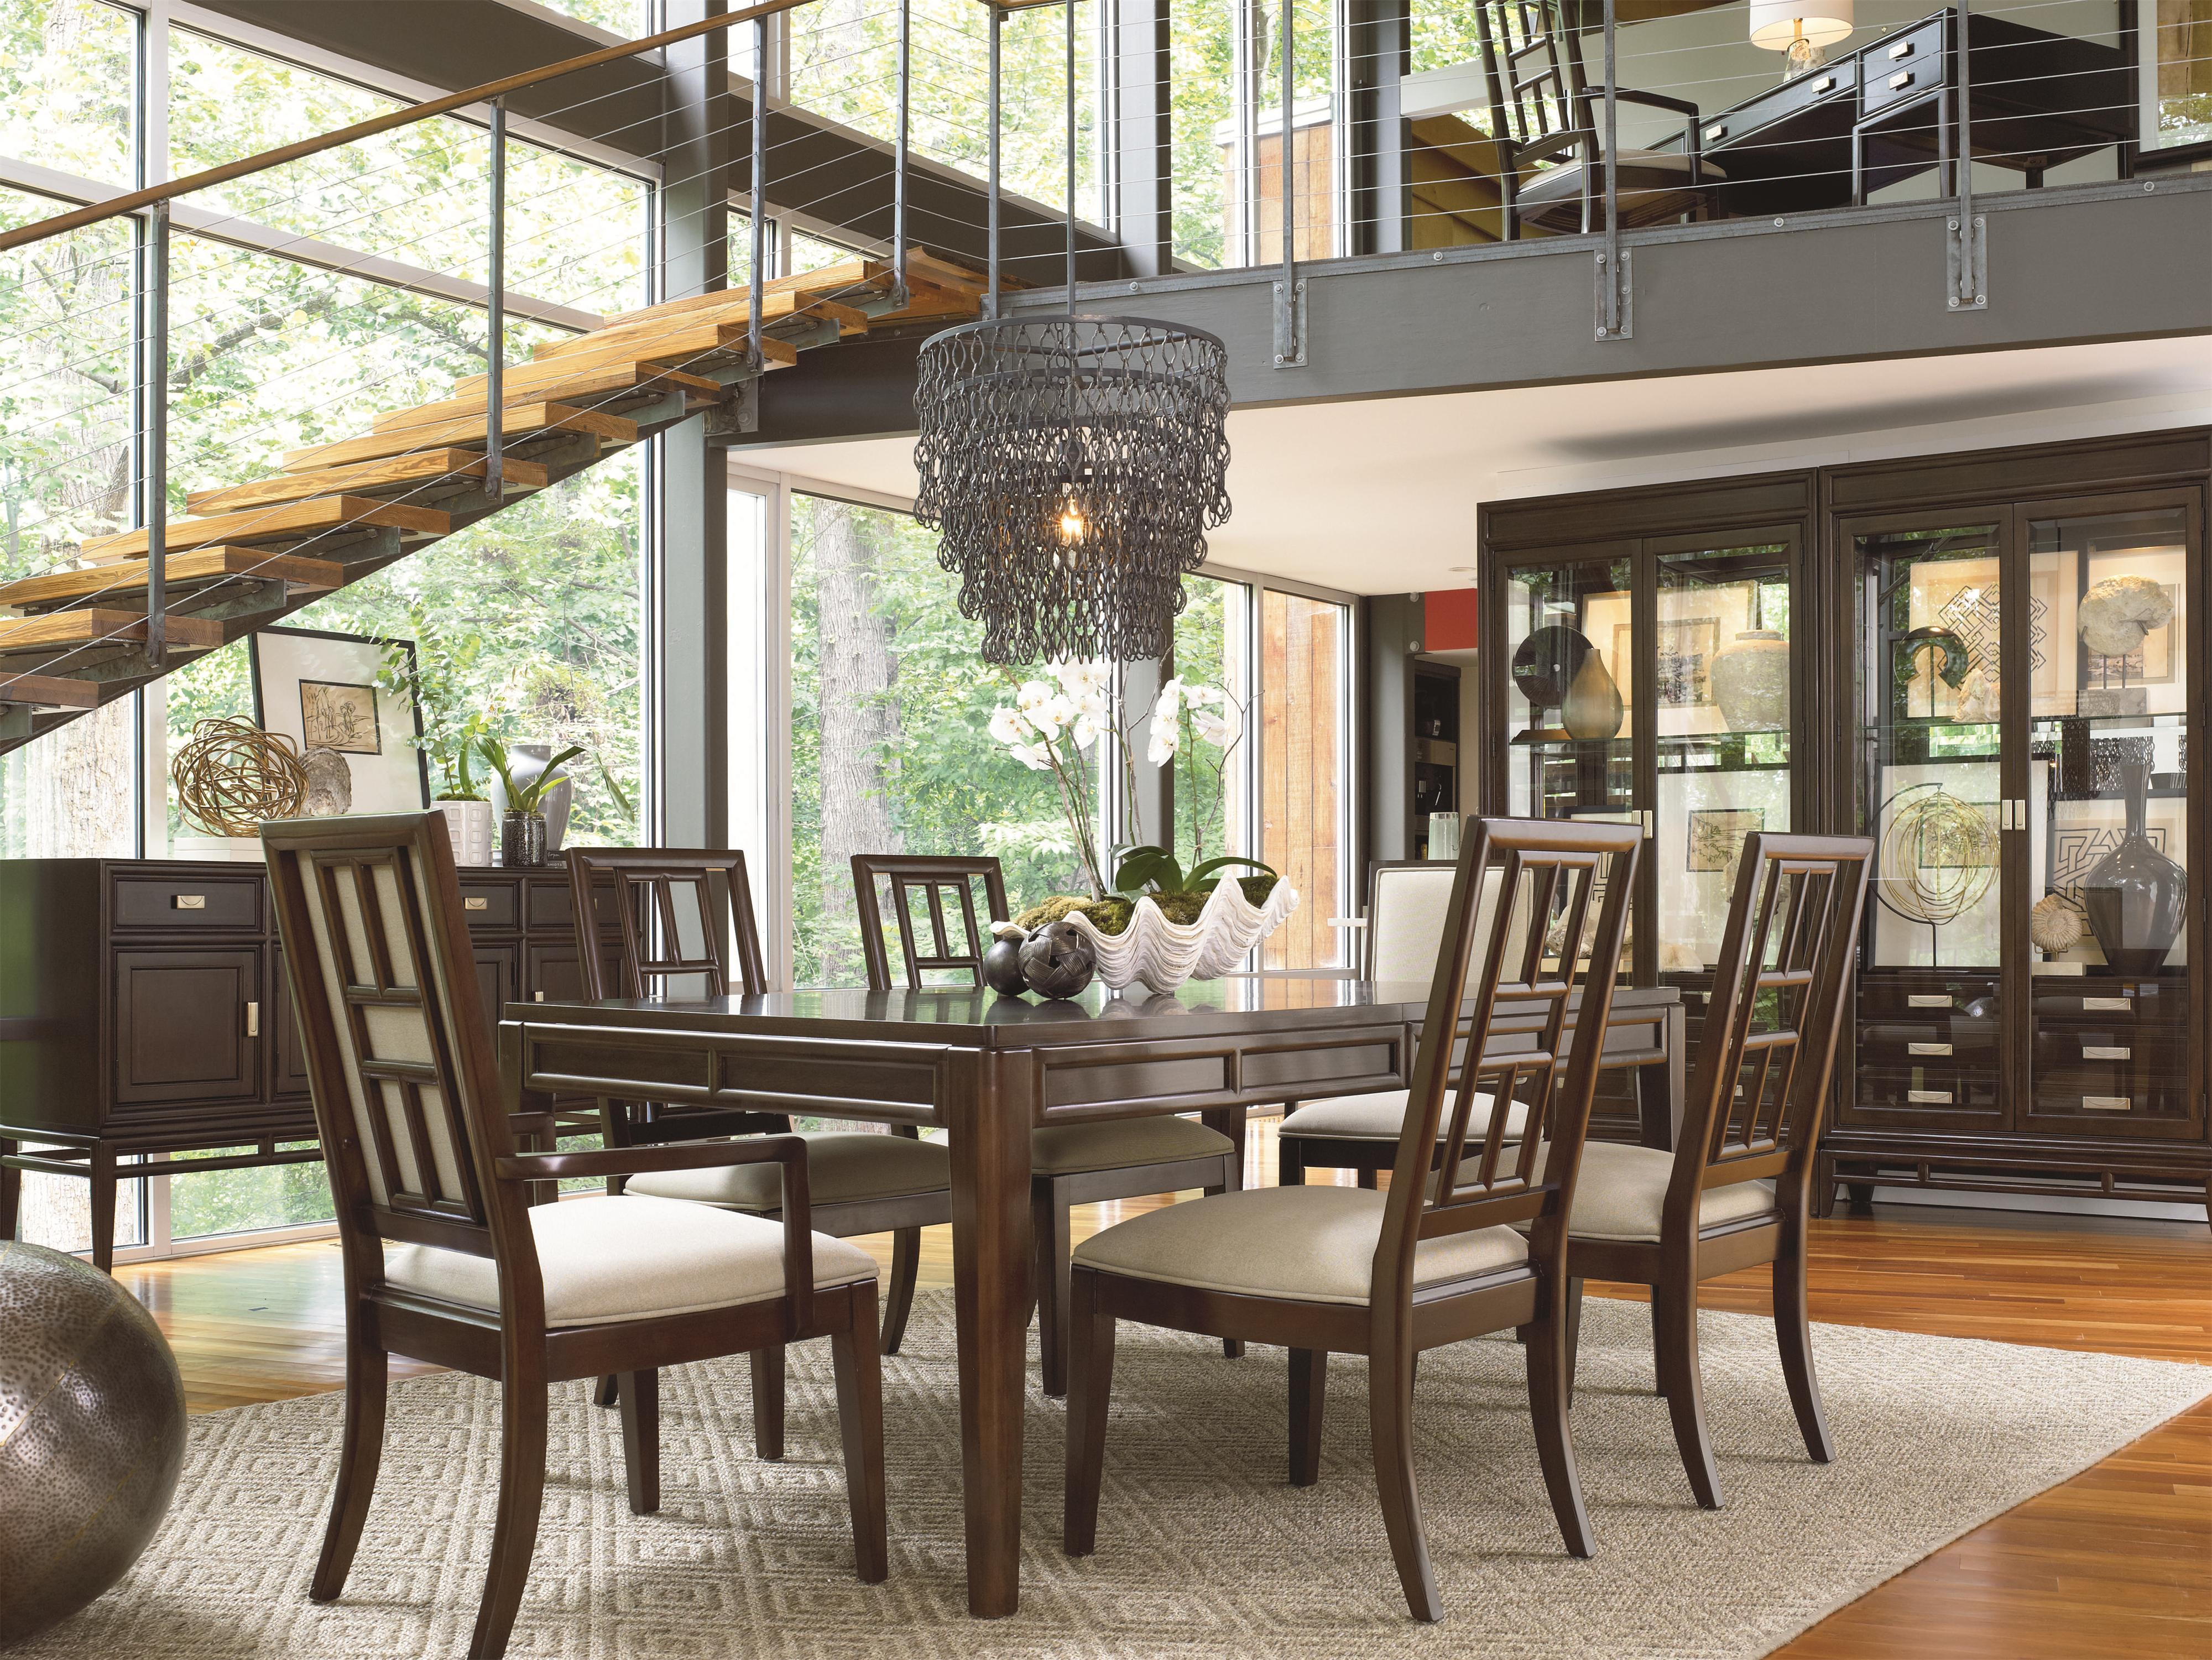 Thomasville Dining Room Sets Lantau 826 By Thomasvillear Baer39s Furniture Thomasville